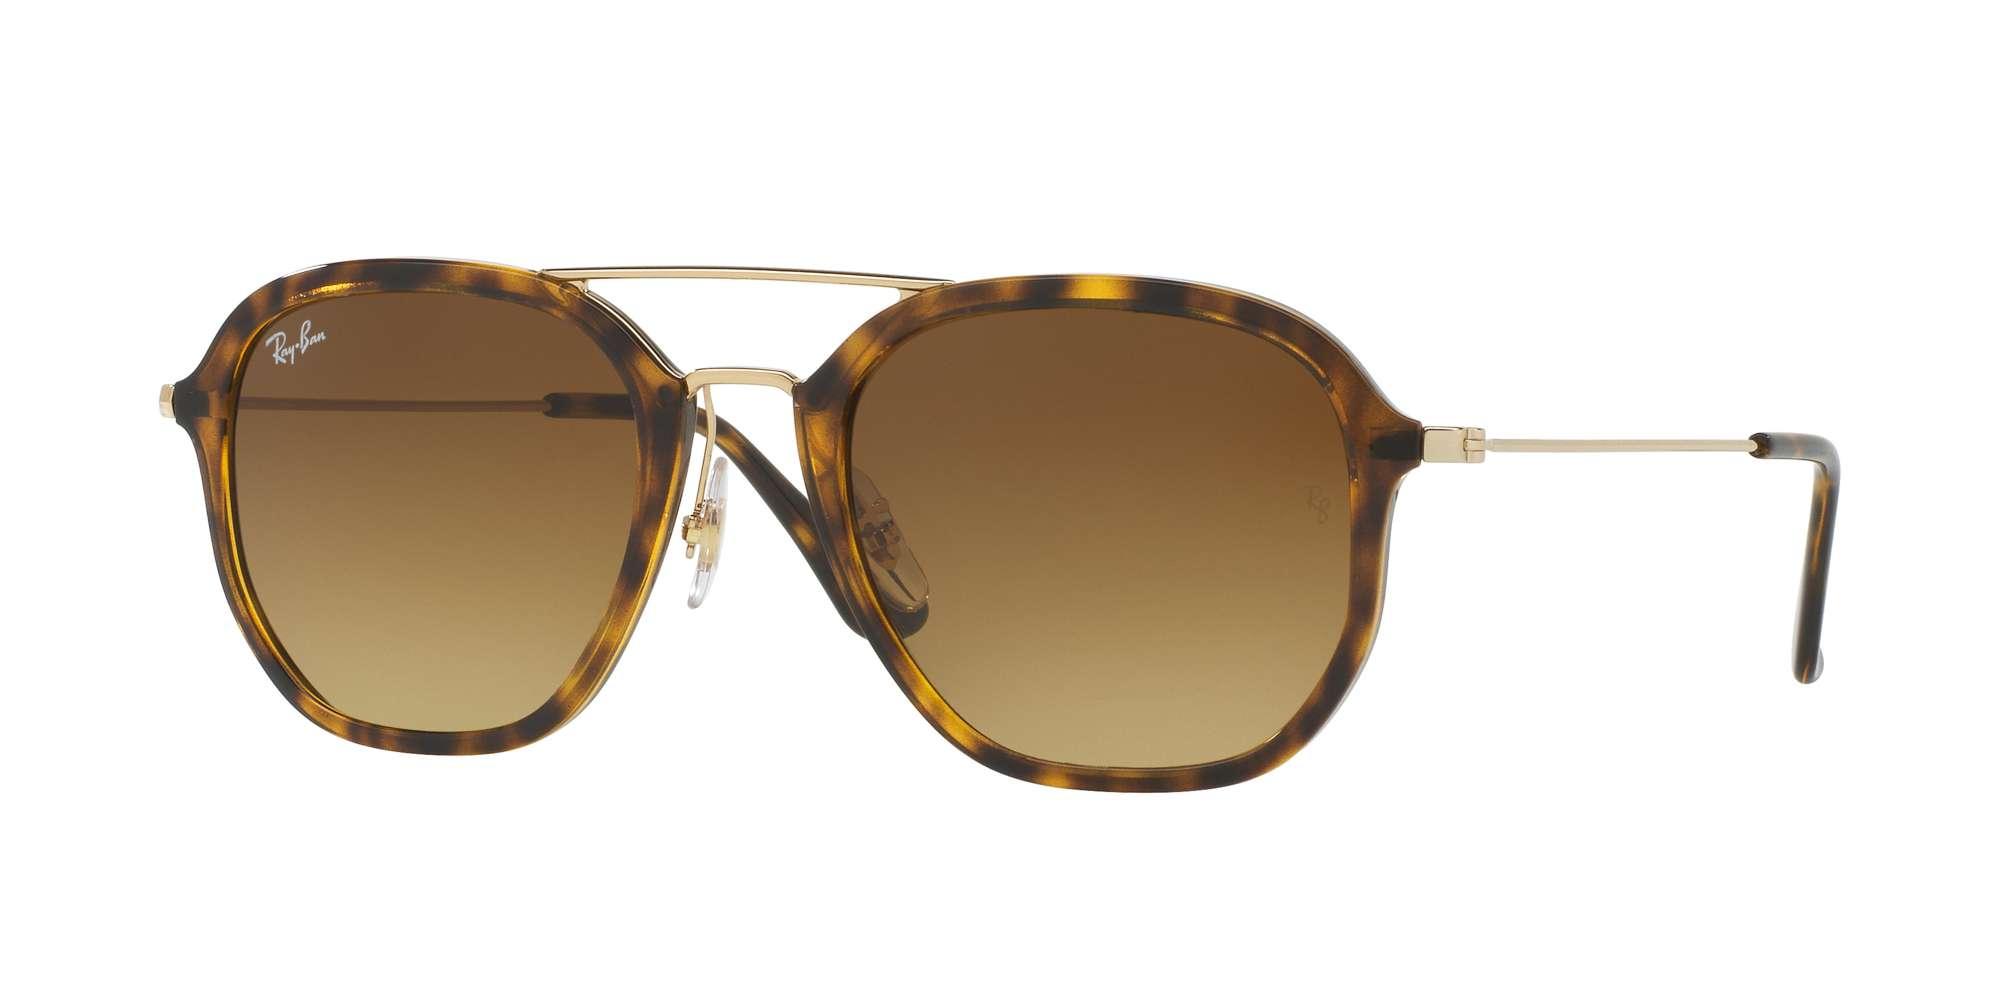 HAVANA / GRADIENT BROWN lenses